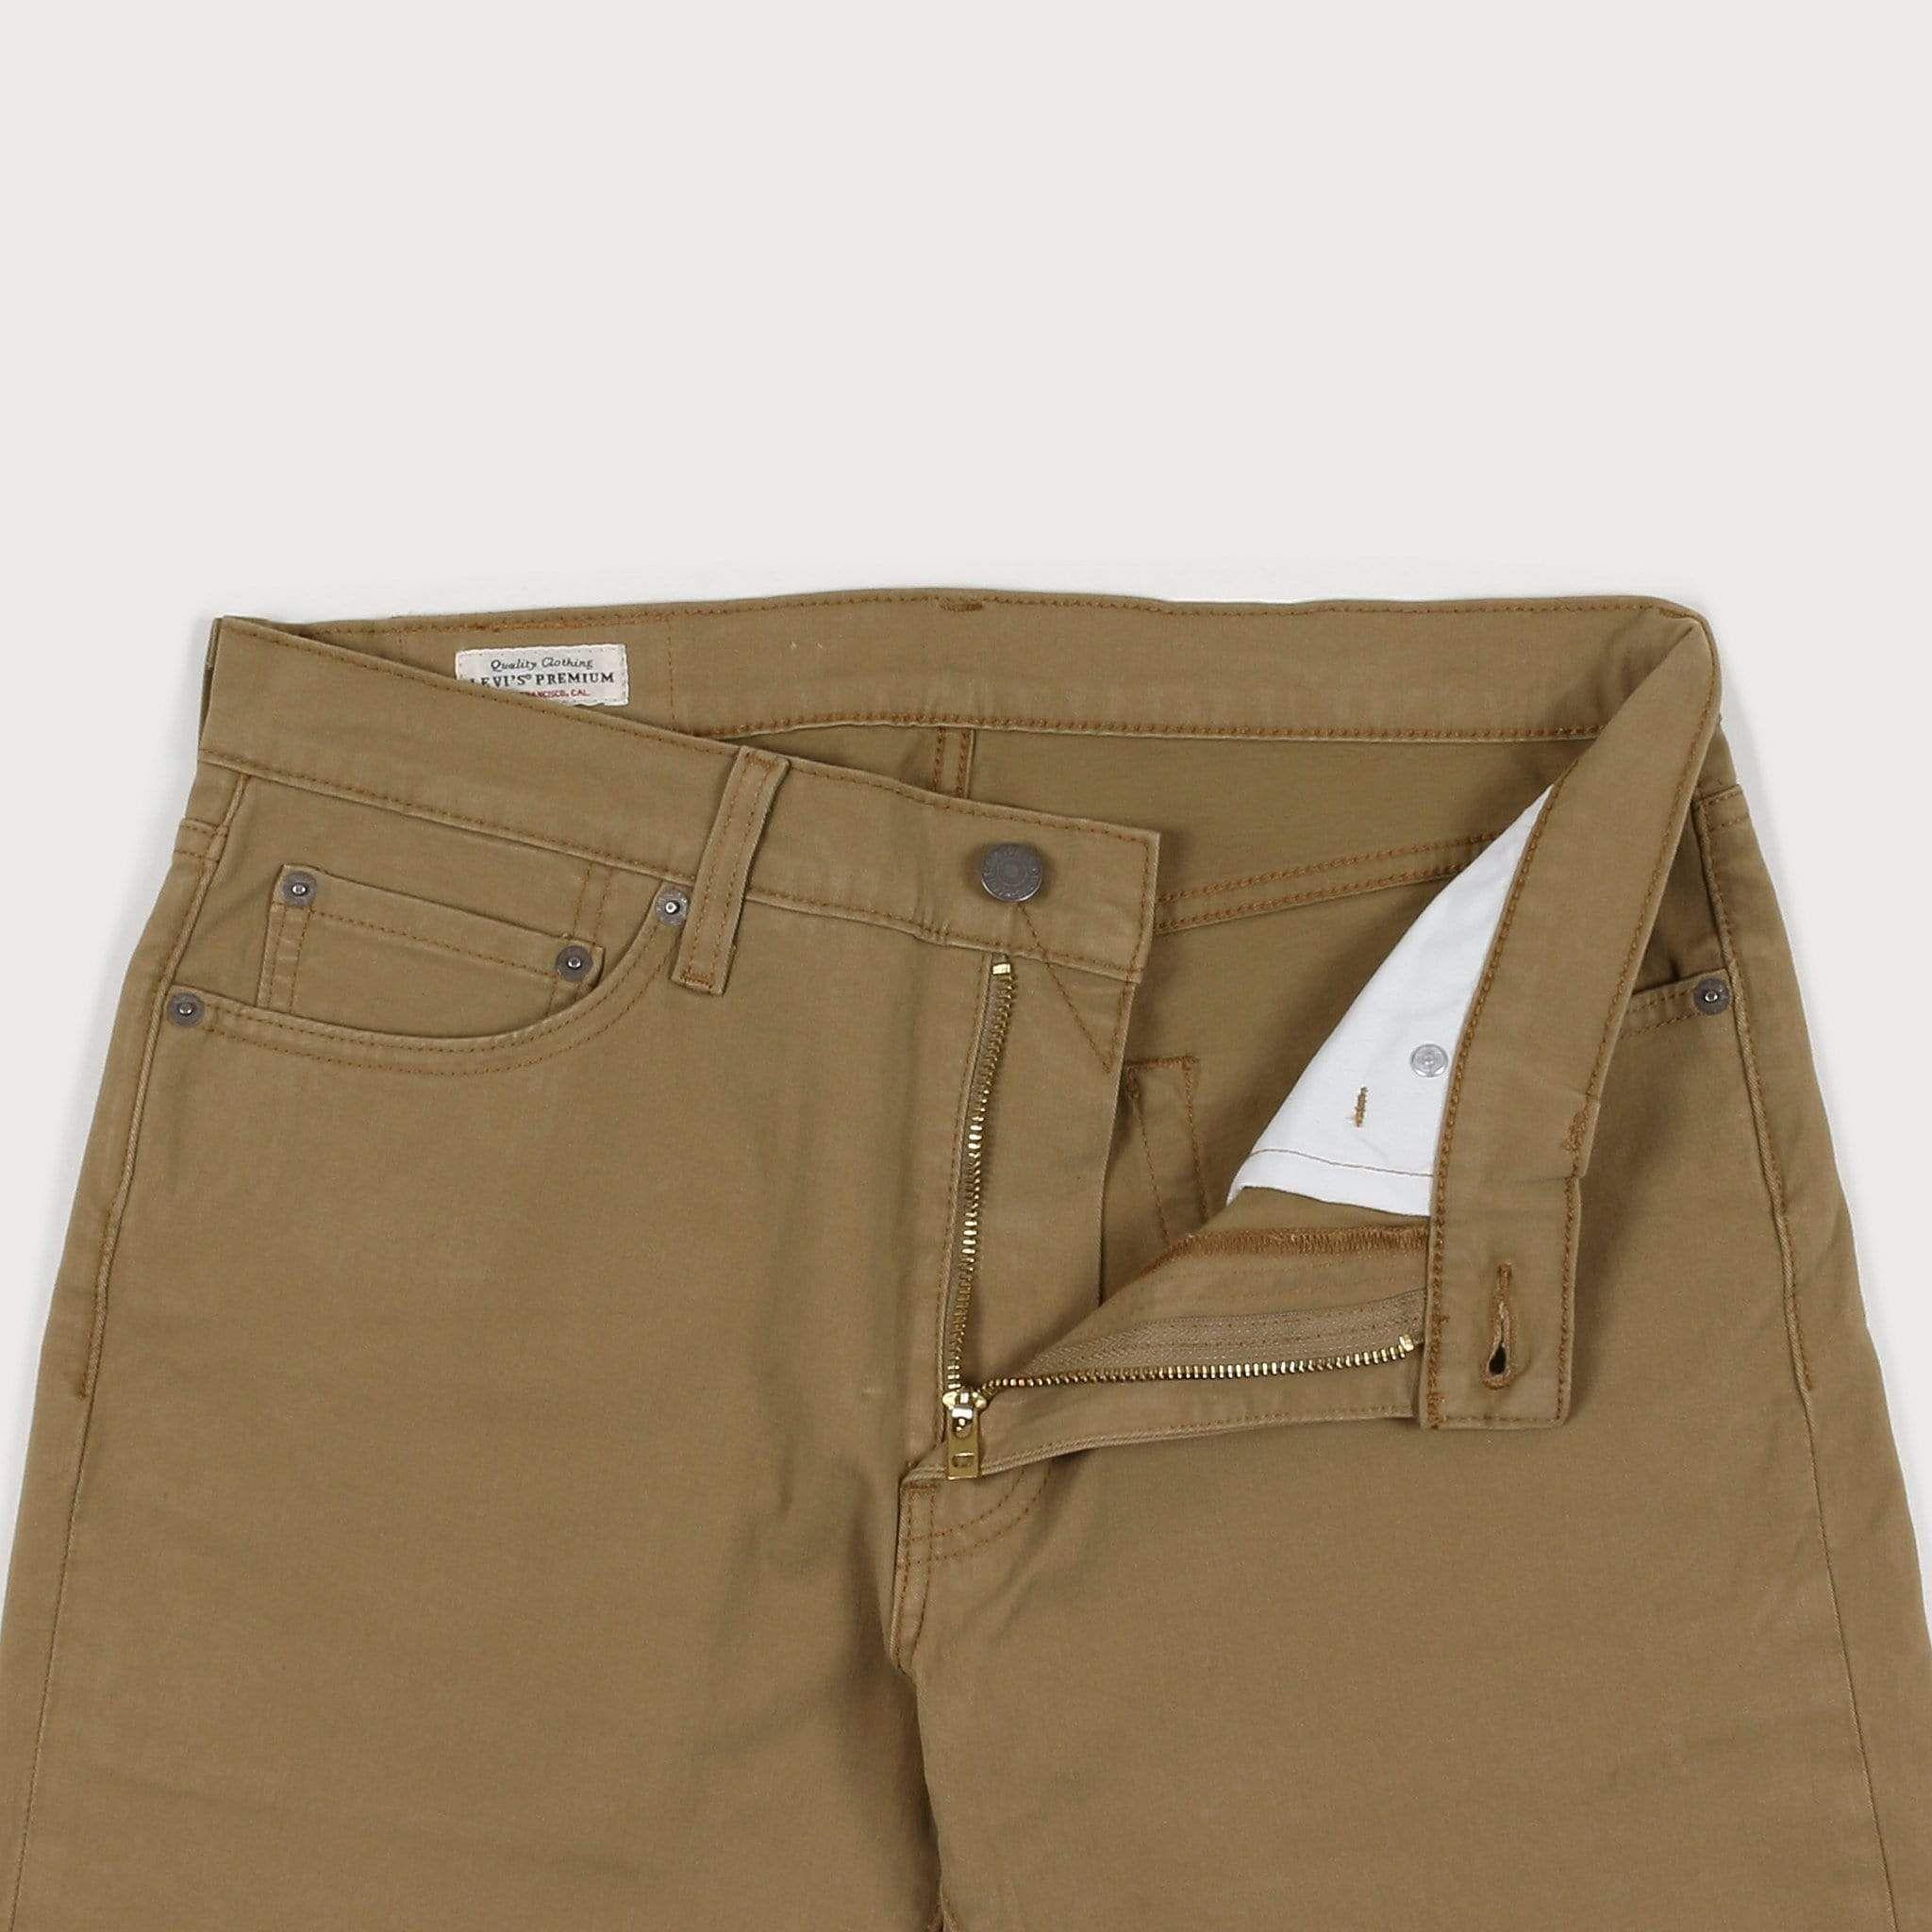 Levi's® 511 Slim Fit Mens Jeans Harvest Gold Bi Stretch